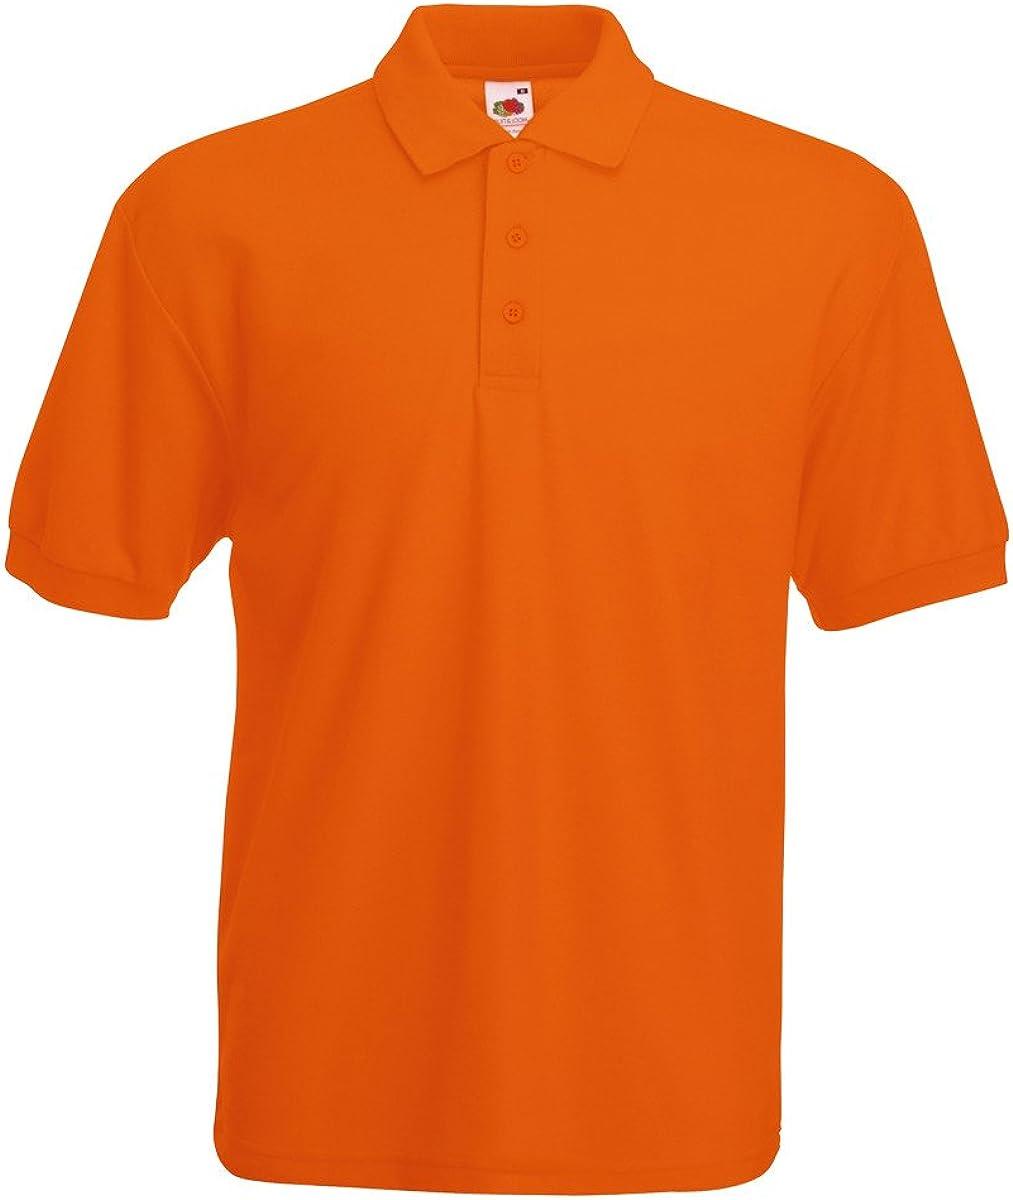 Pack de 3: polo para hombre 65/35 de manga corta de Fruit of the Loom, lavar a 60 ° Naranja naranja 3XL: Amazon.es: Ropa y accesorios